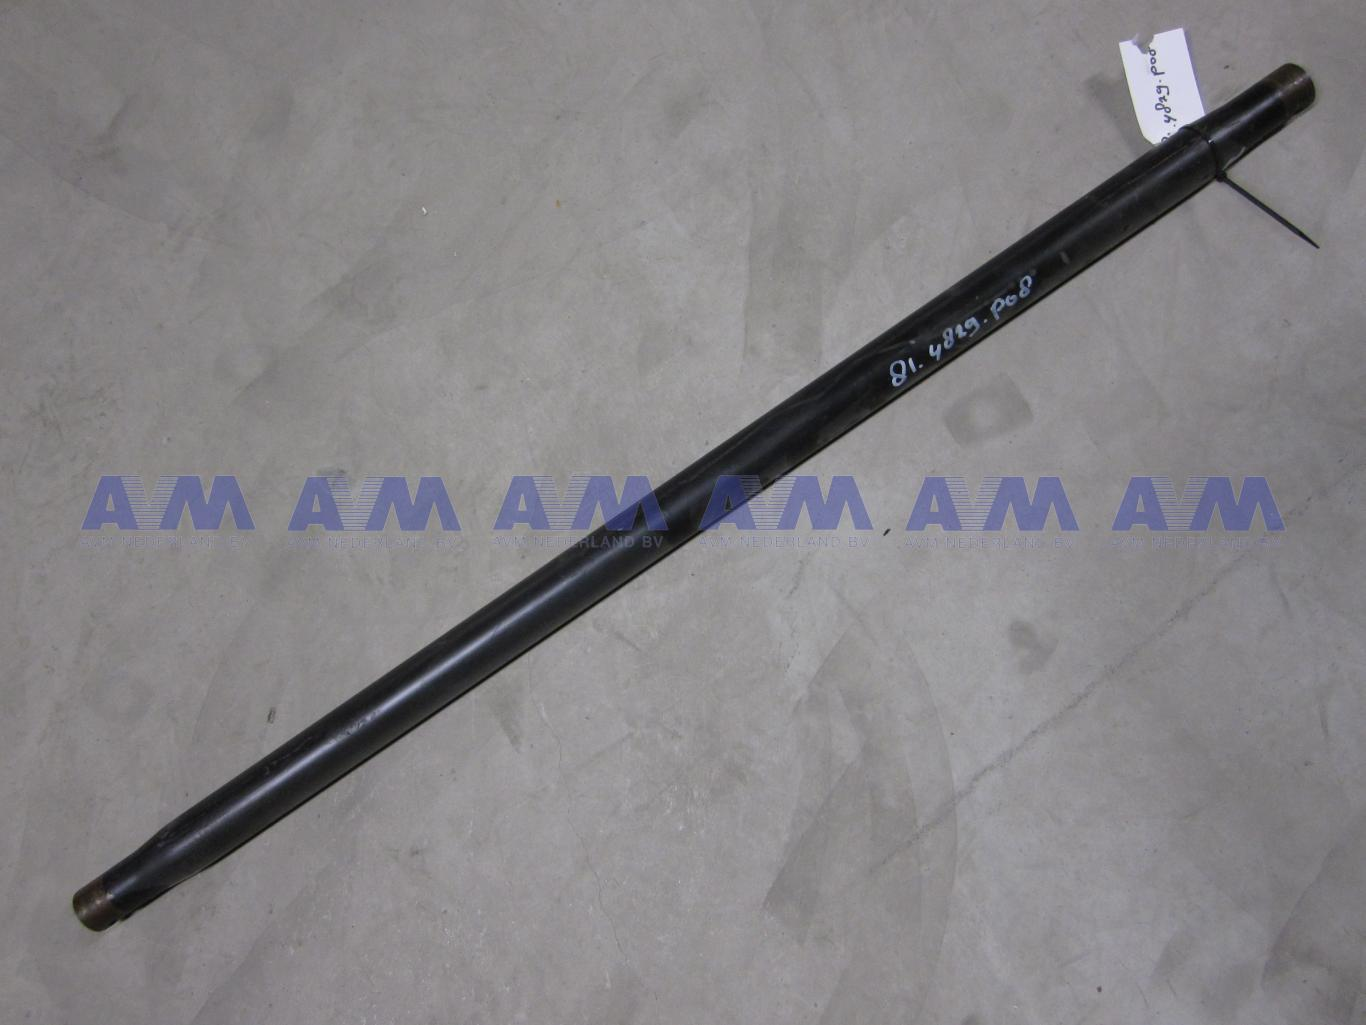 Spoorstang L=1360/1265 mm gebruikt 81.4829.P8-G Kessler